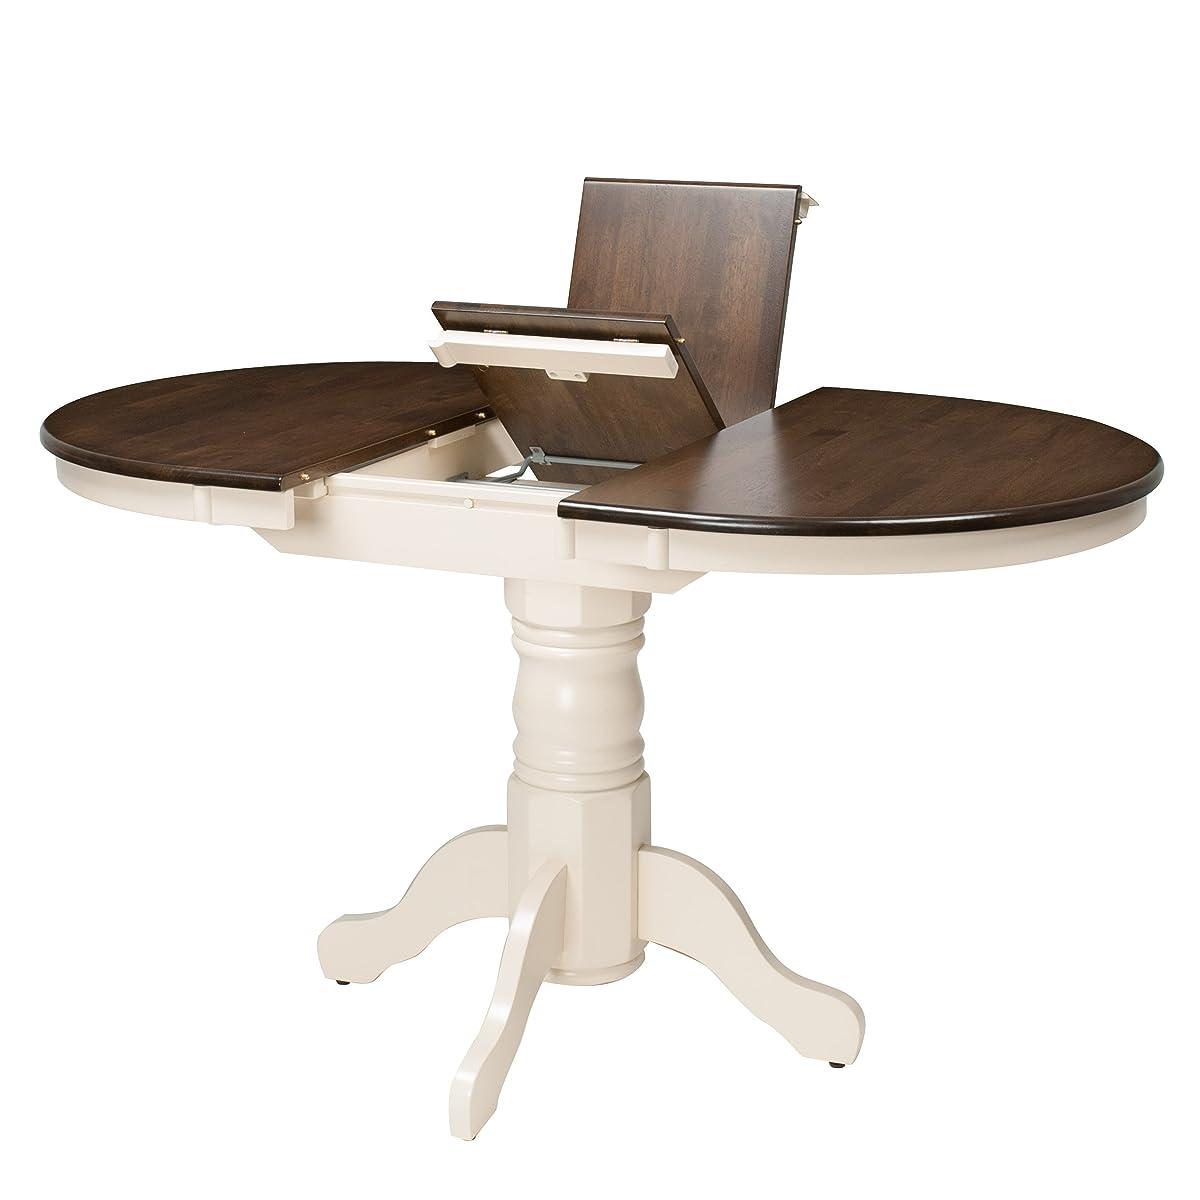 CorLiving DSH-470-T Dillon Dining Table, Dark Brown/Cream